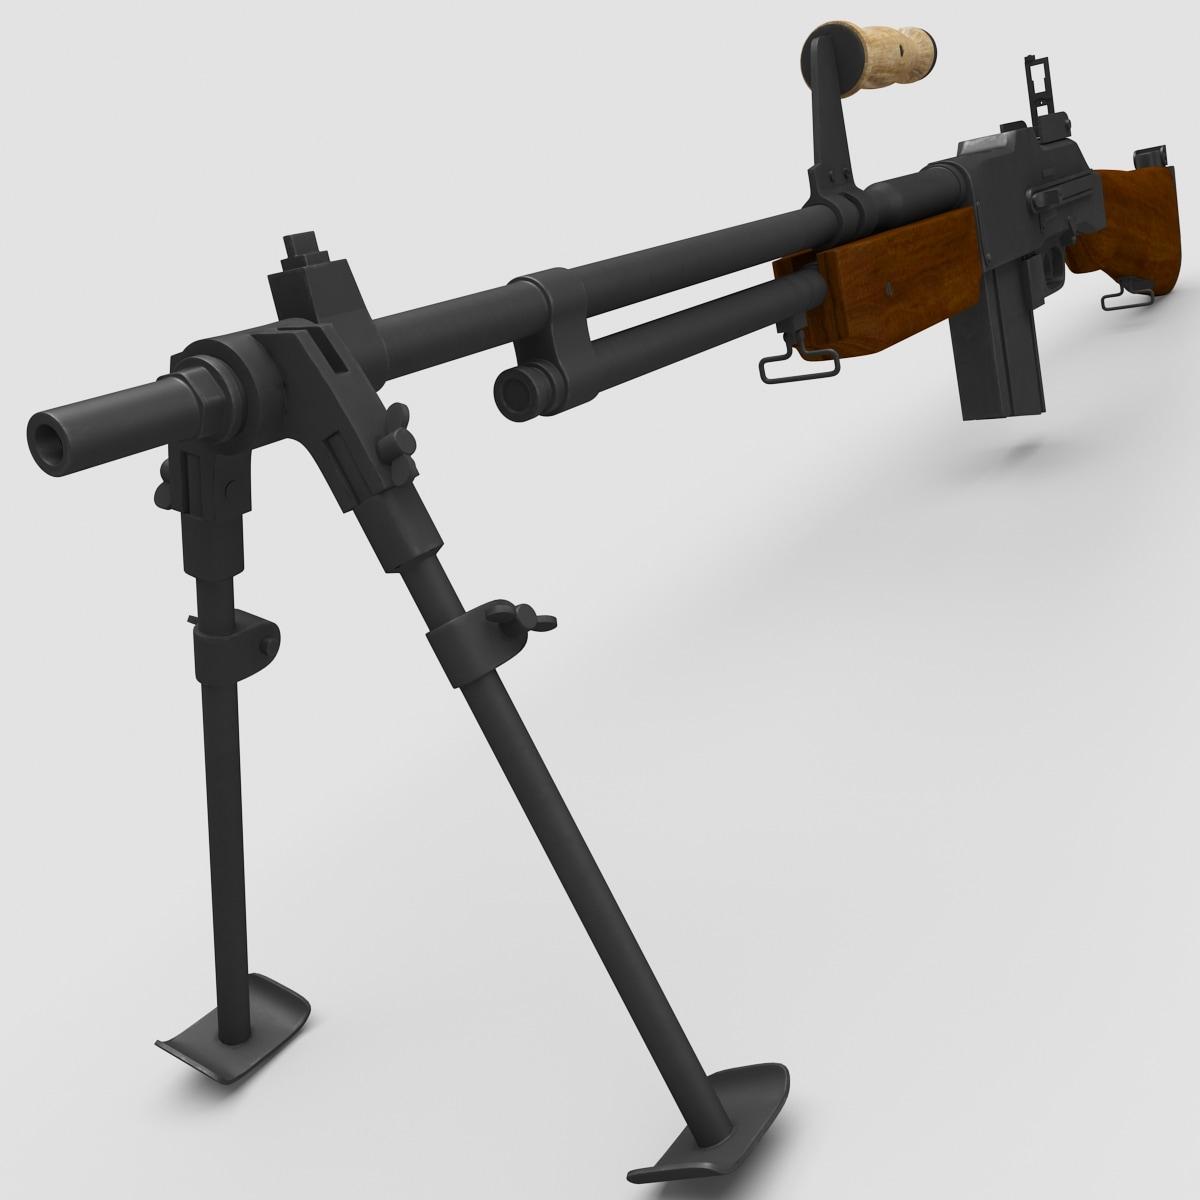 x m1918a2 browning automatic rifle gun